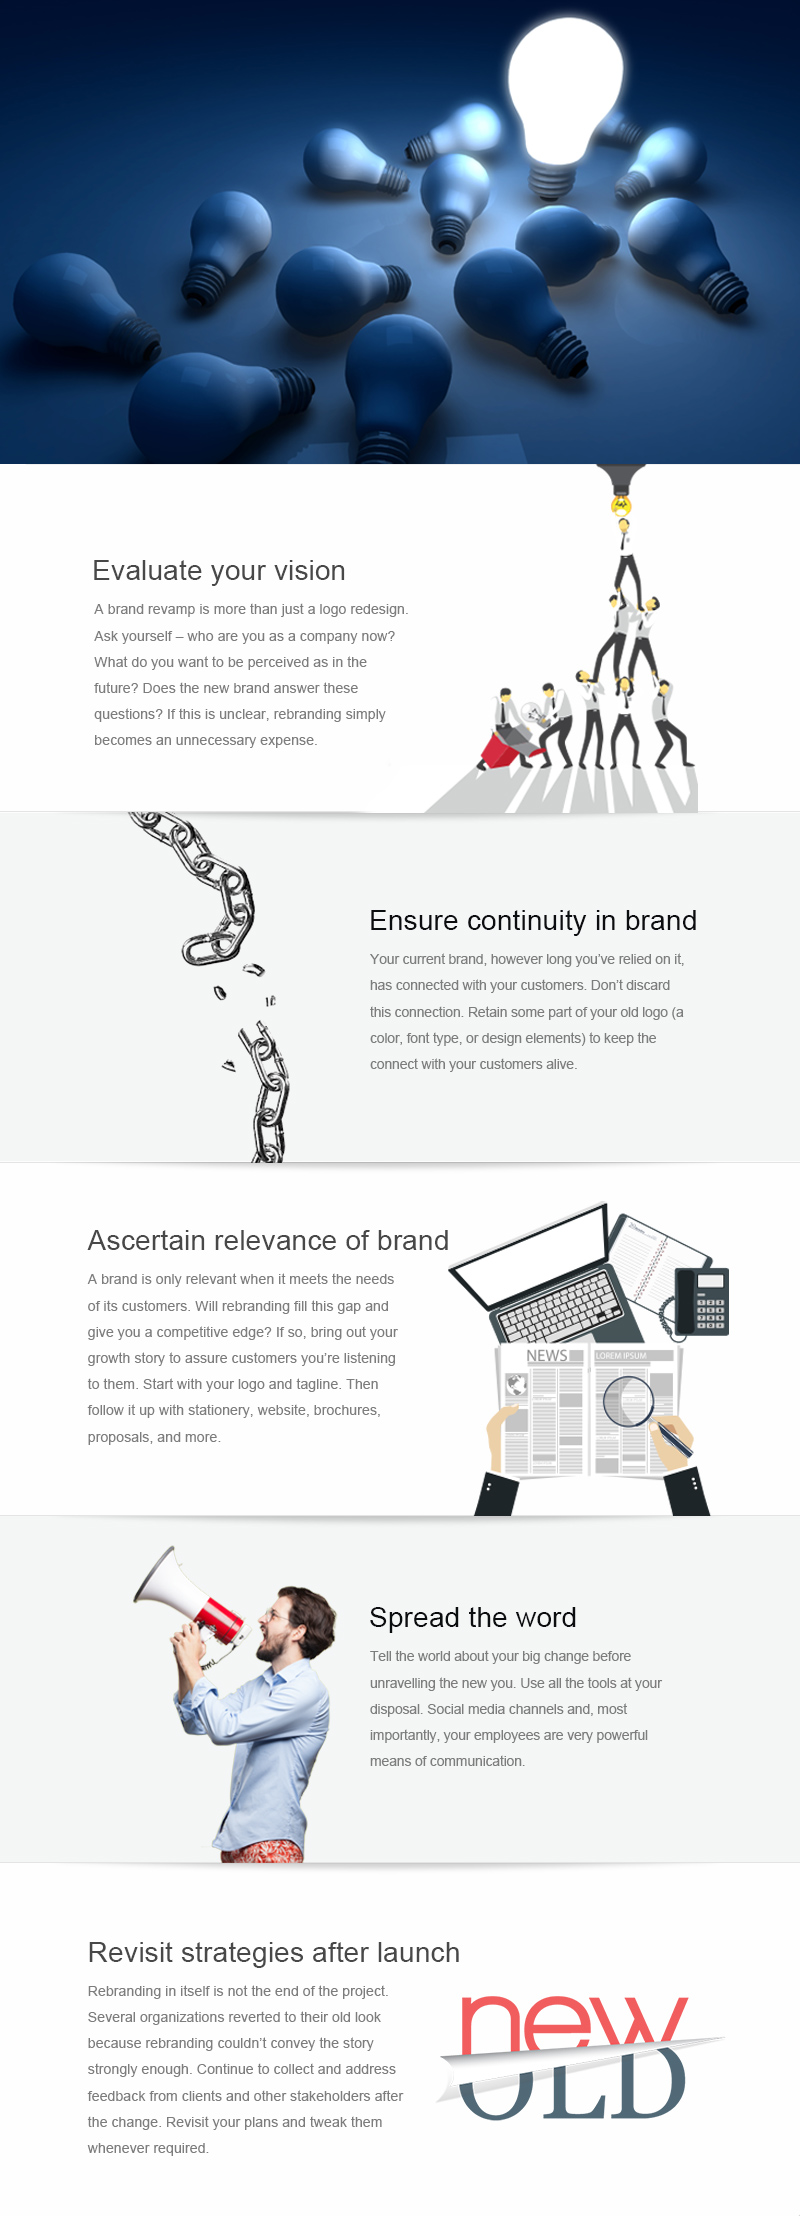 brand revamping strategies